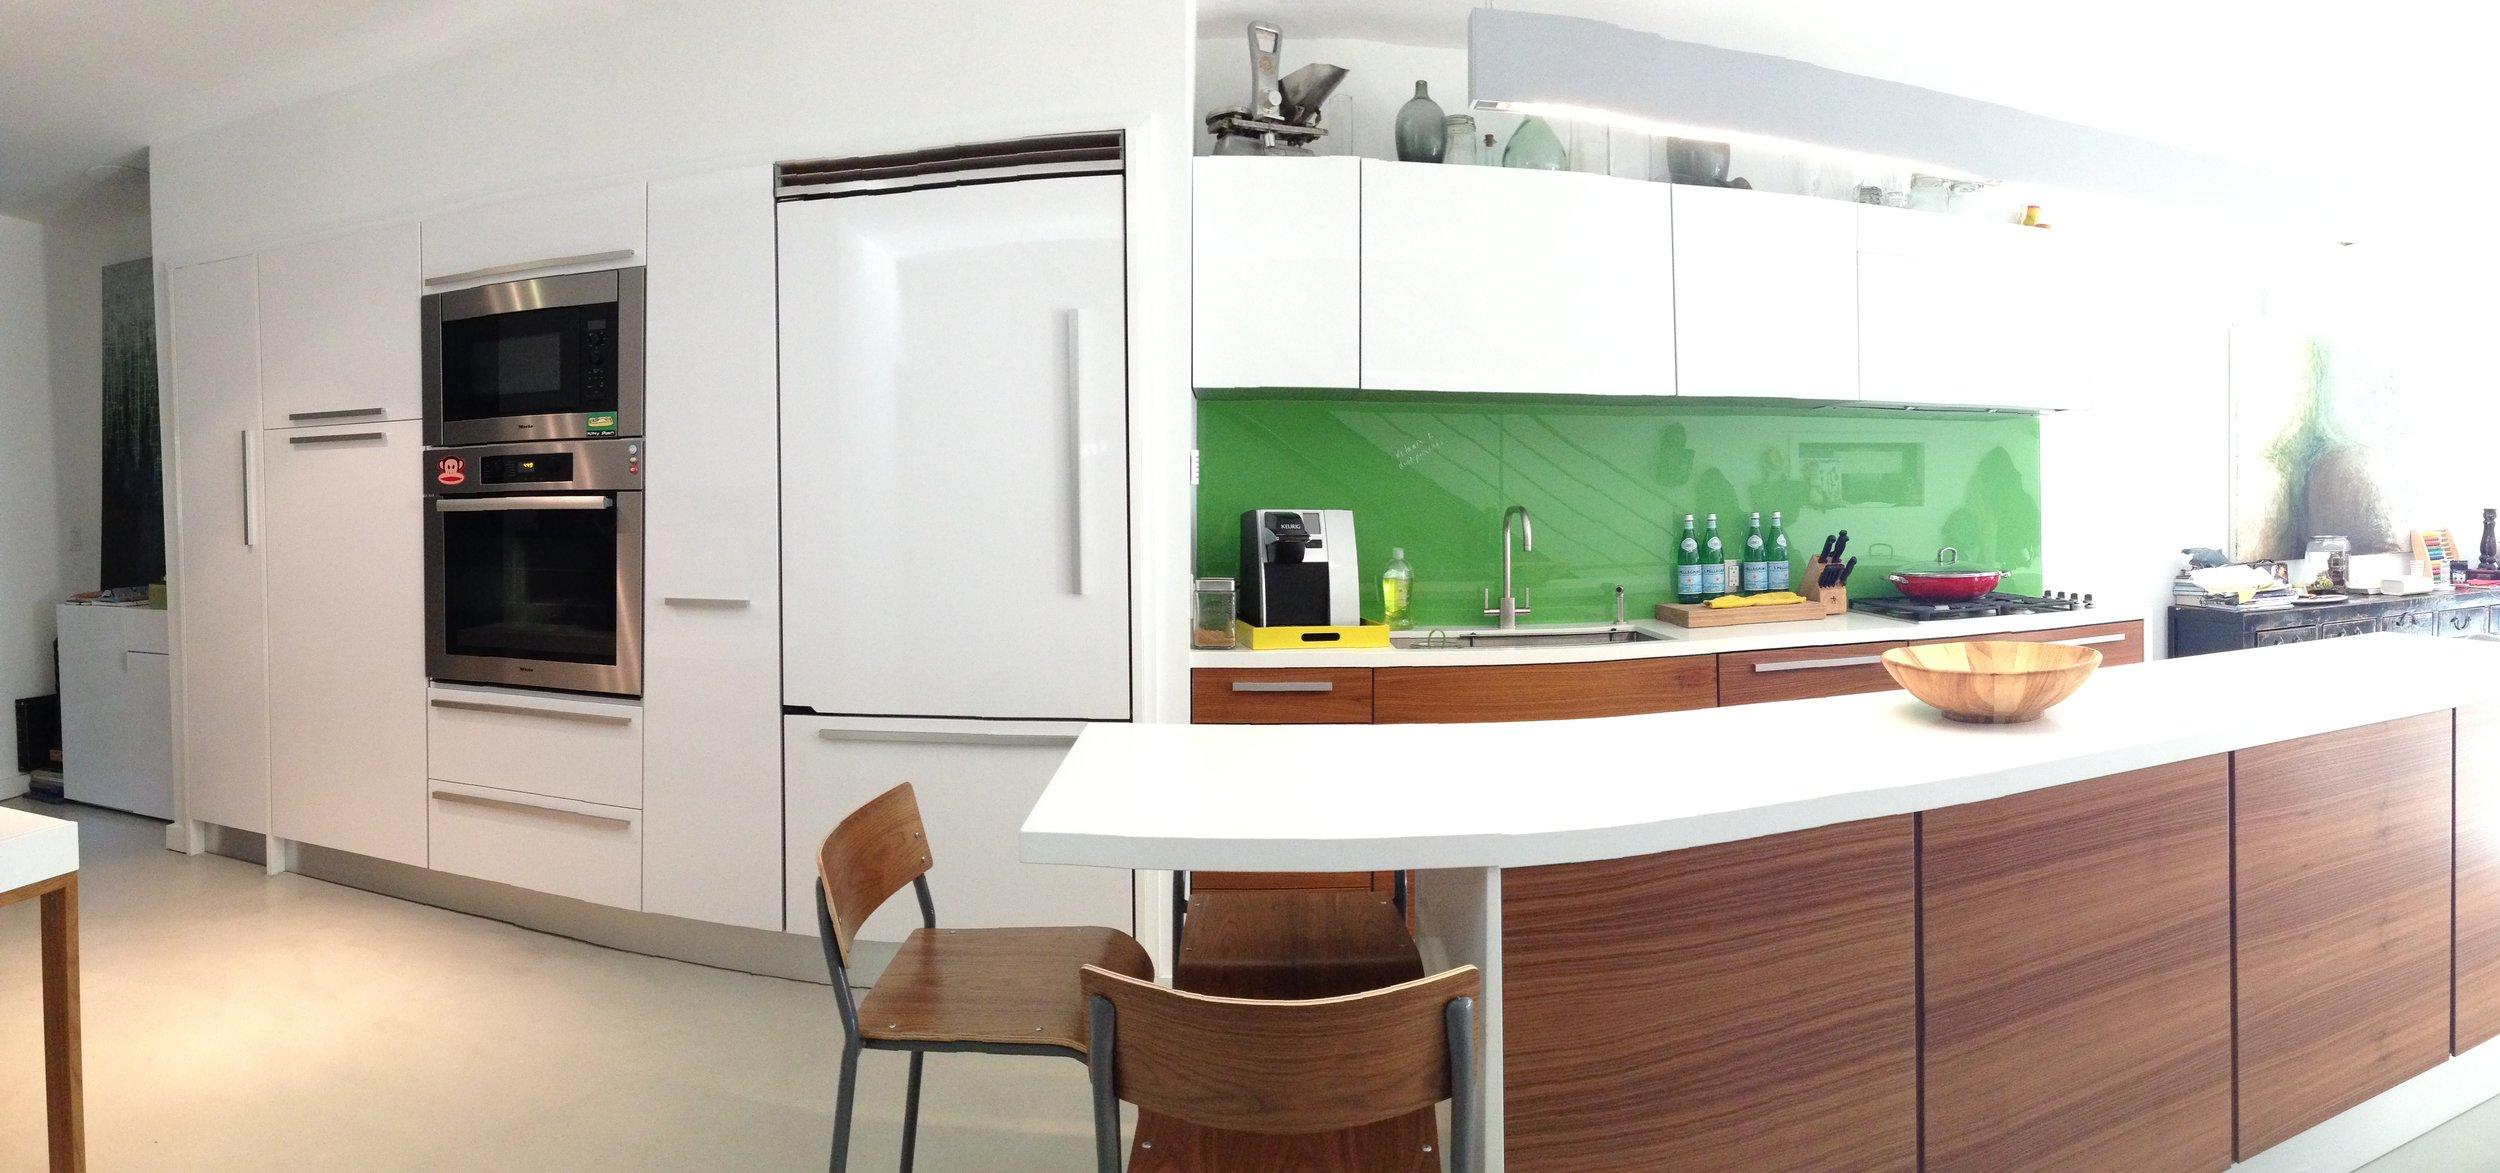 Kitchen 22 Pic 3.JPG